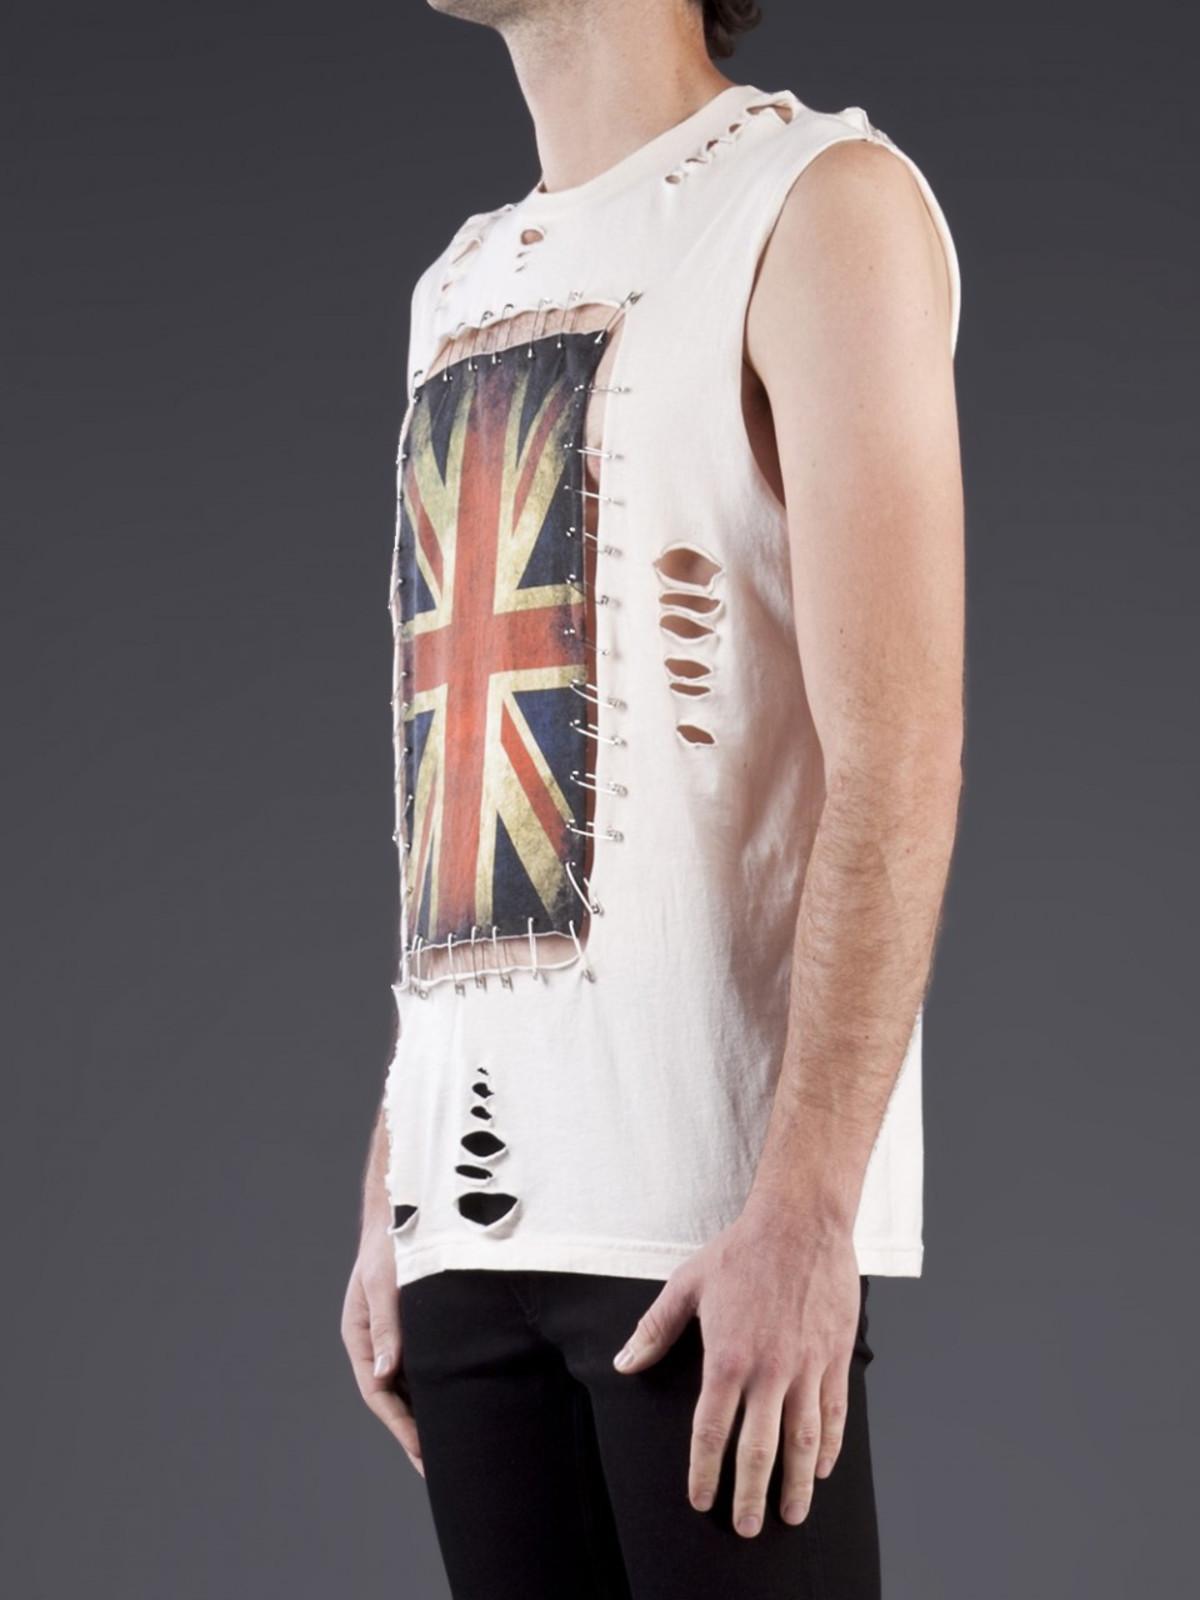 Any Old Iron Union Jack Pin T Shirt Garmentory